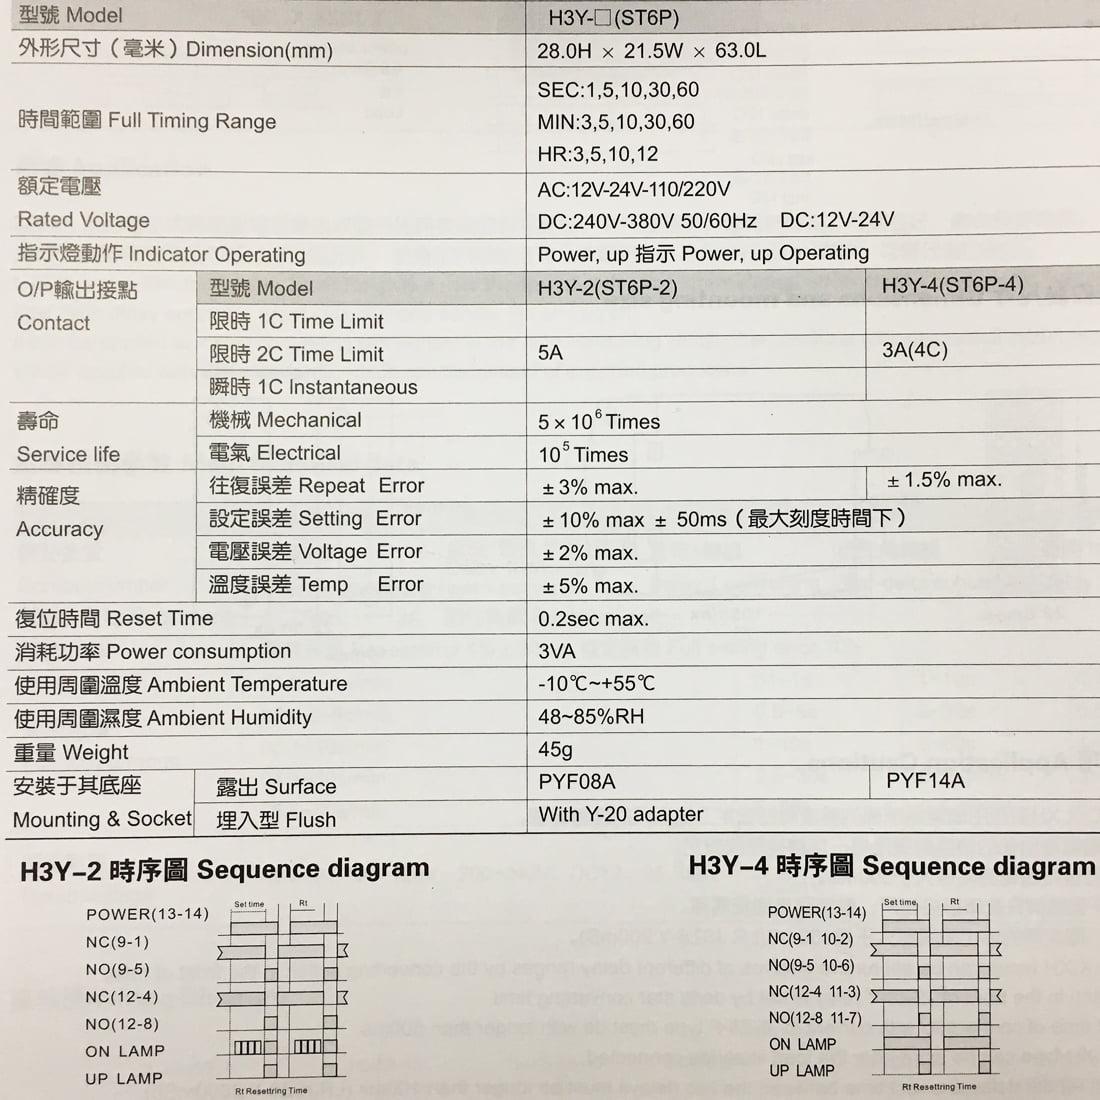 H3y 2 Dc 12v Wiring Diagram - Wiring Diagrams List H Y Dc V Wiring Diagram on